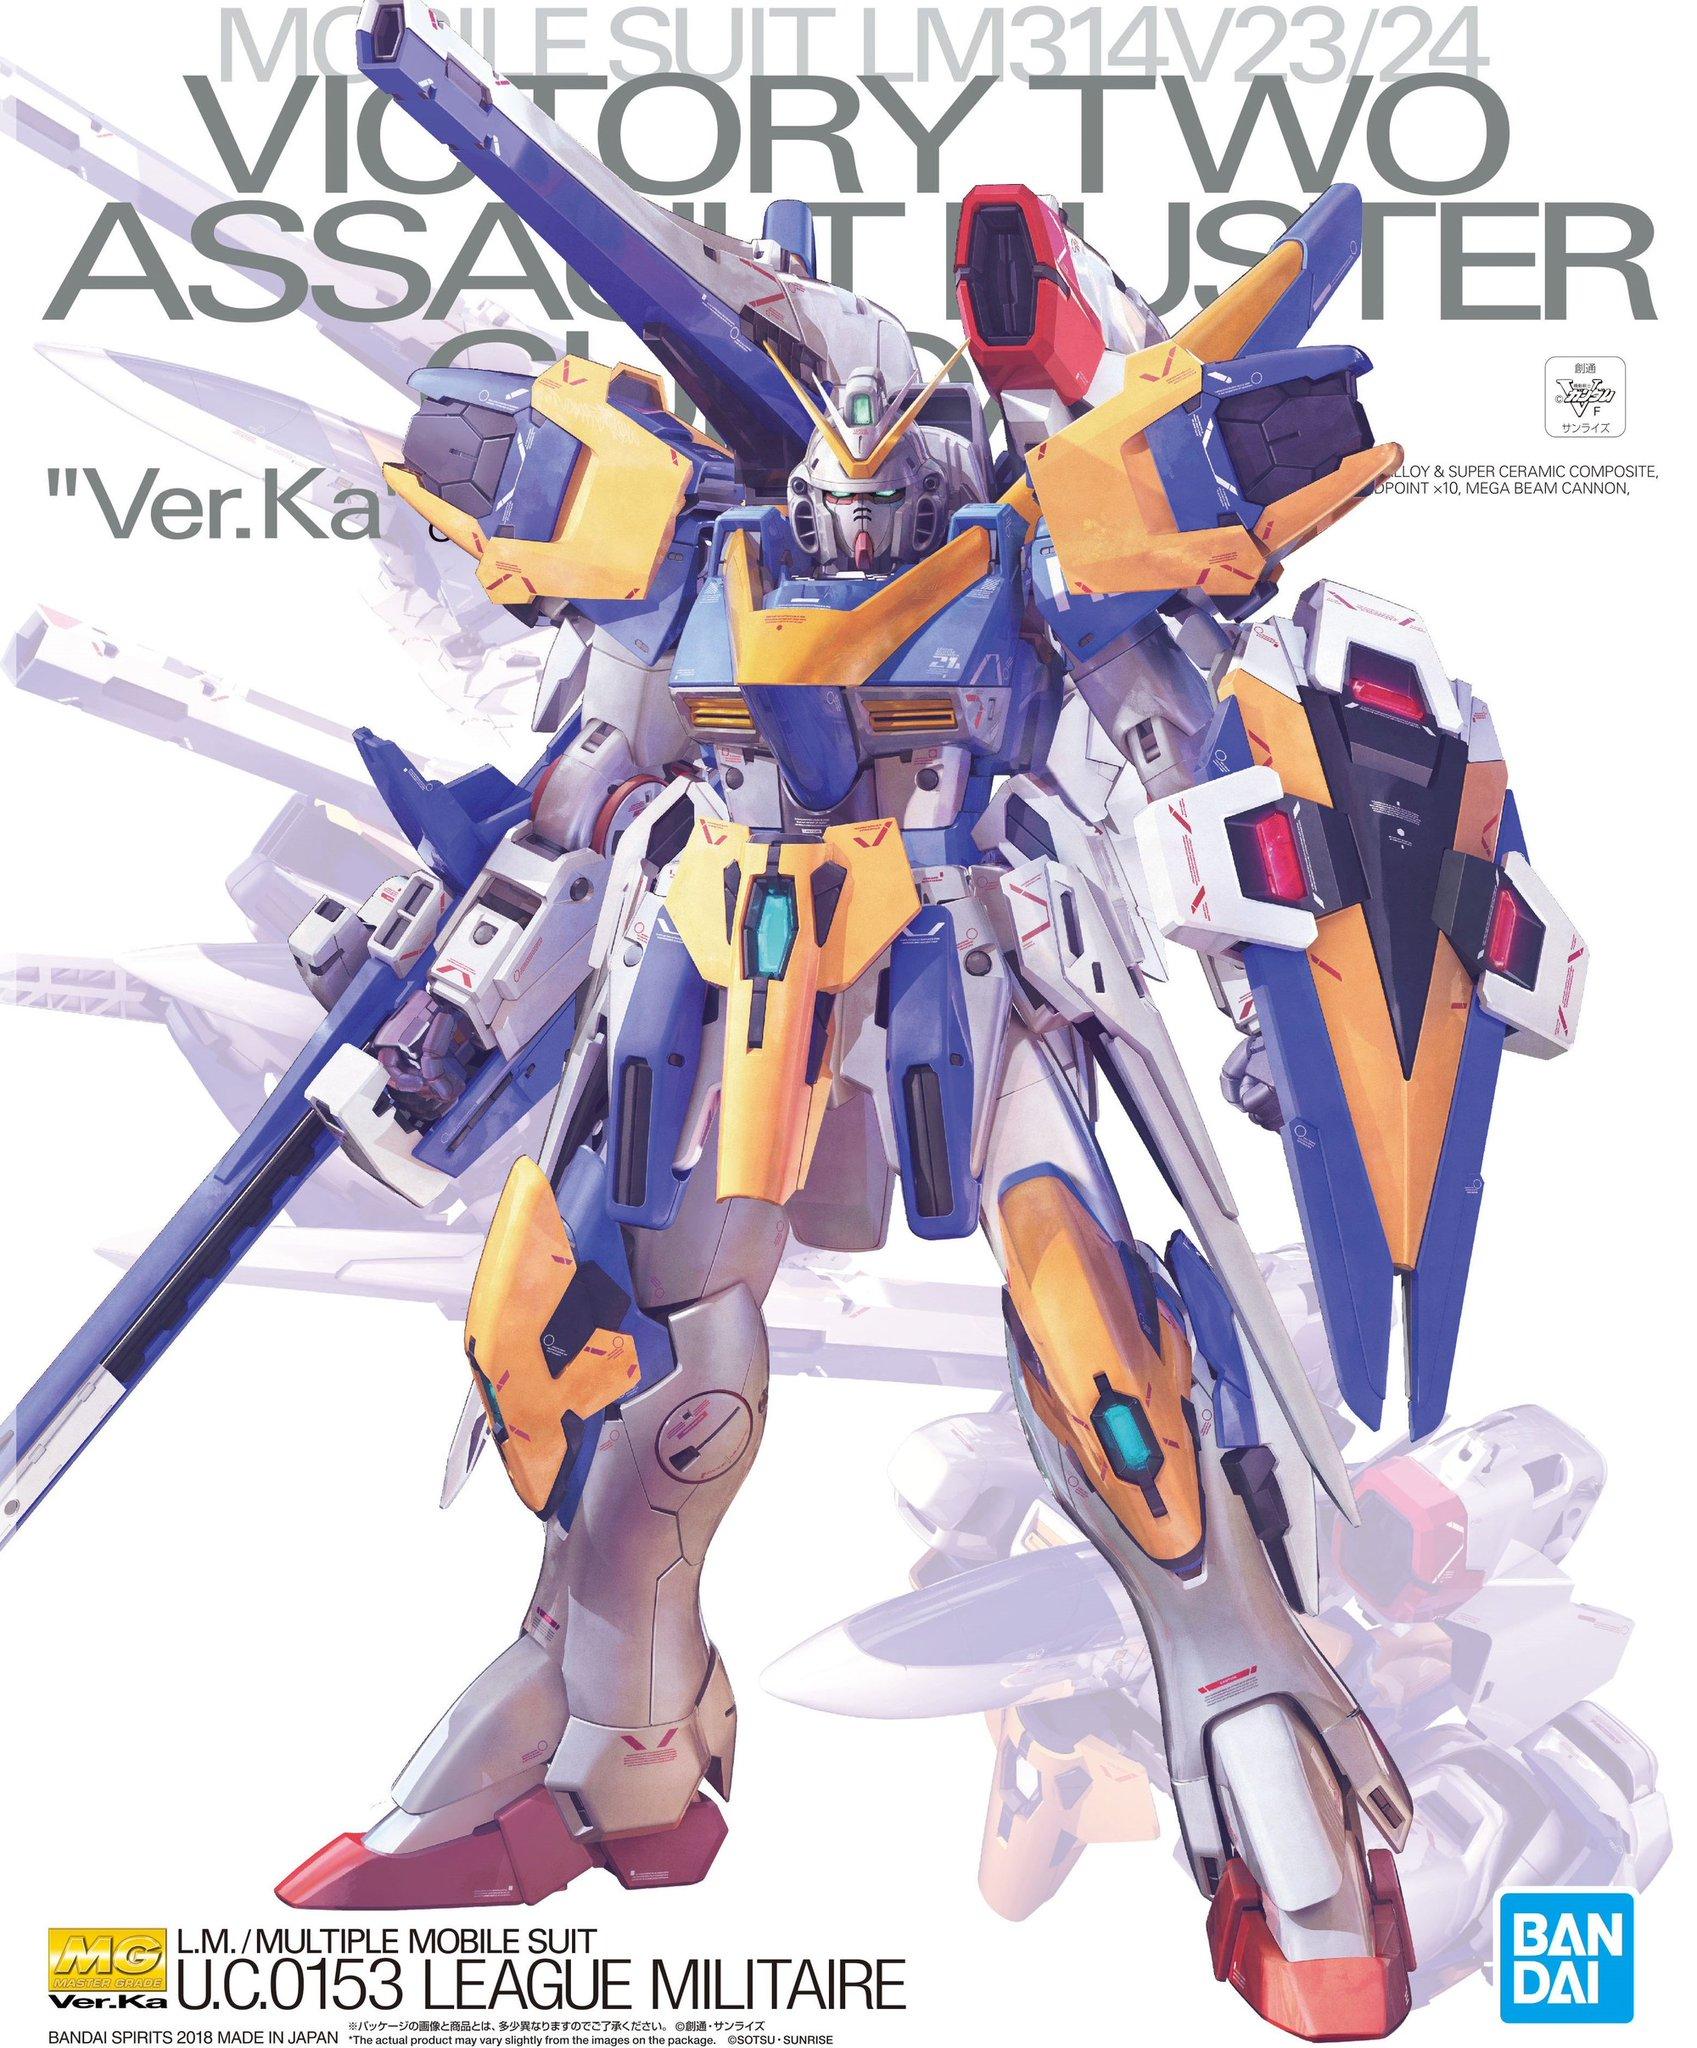 MG 1/100 V2アサルトバスターガンダム Ver.Ka